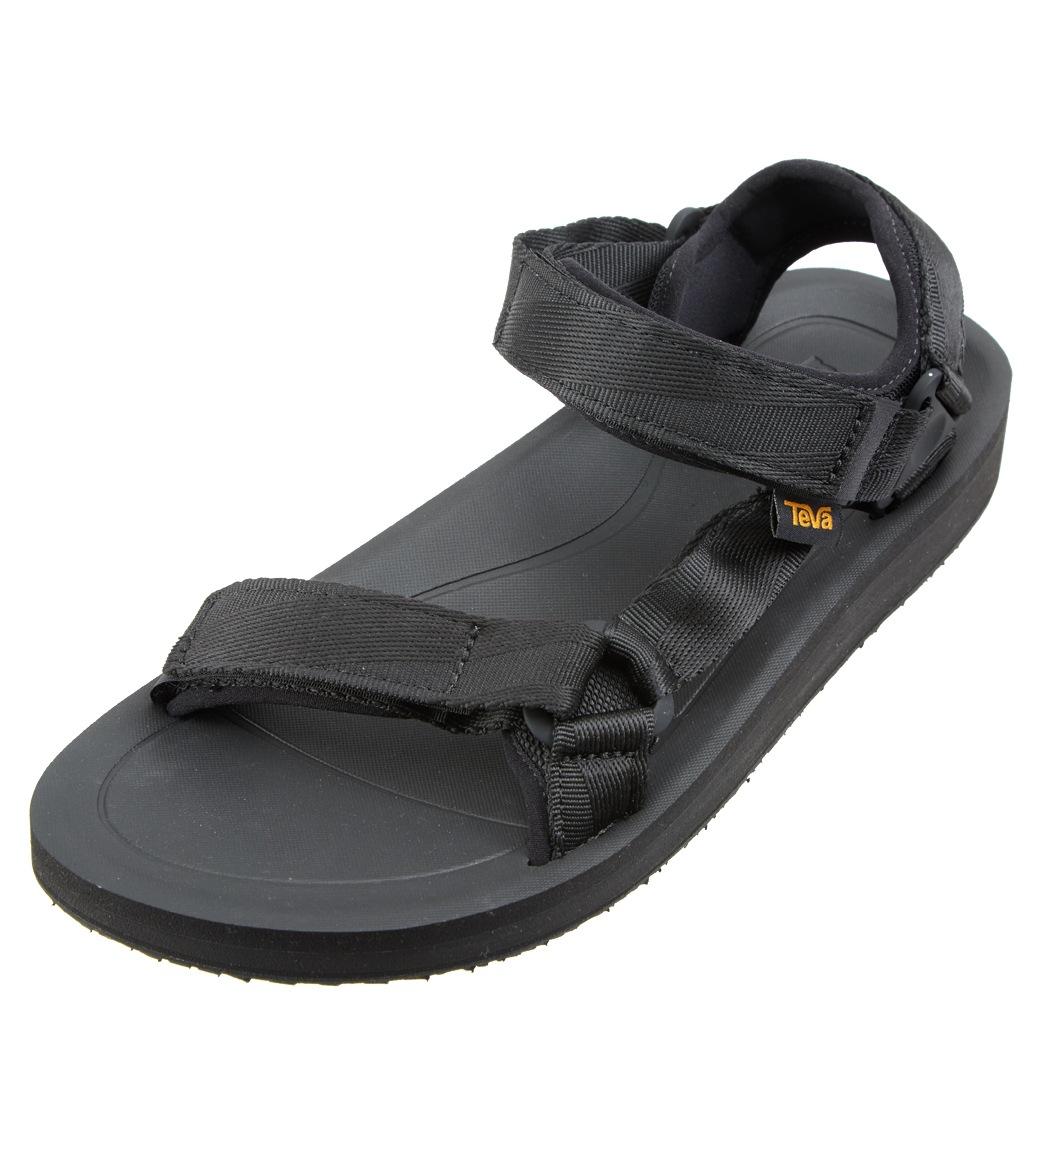 66c658f41132 Teva Men s Original Universal Premier Sandal at SwimOutlet.com - Free  Shipping